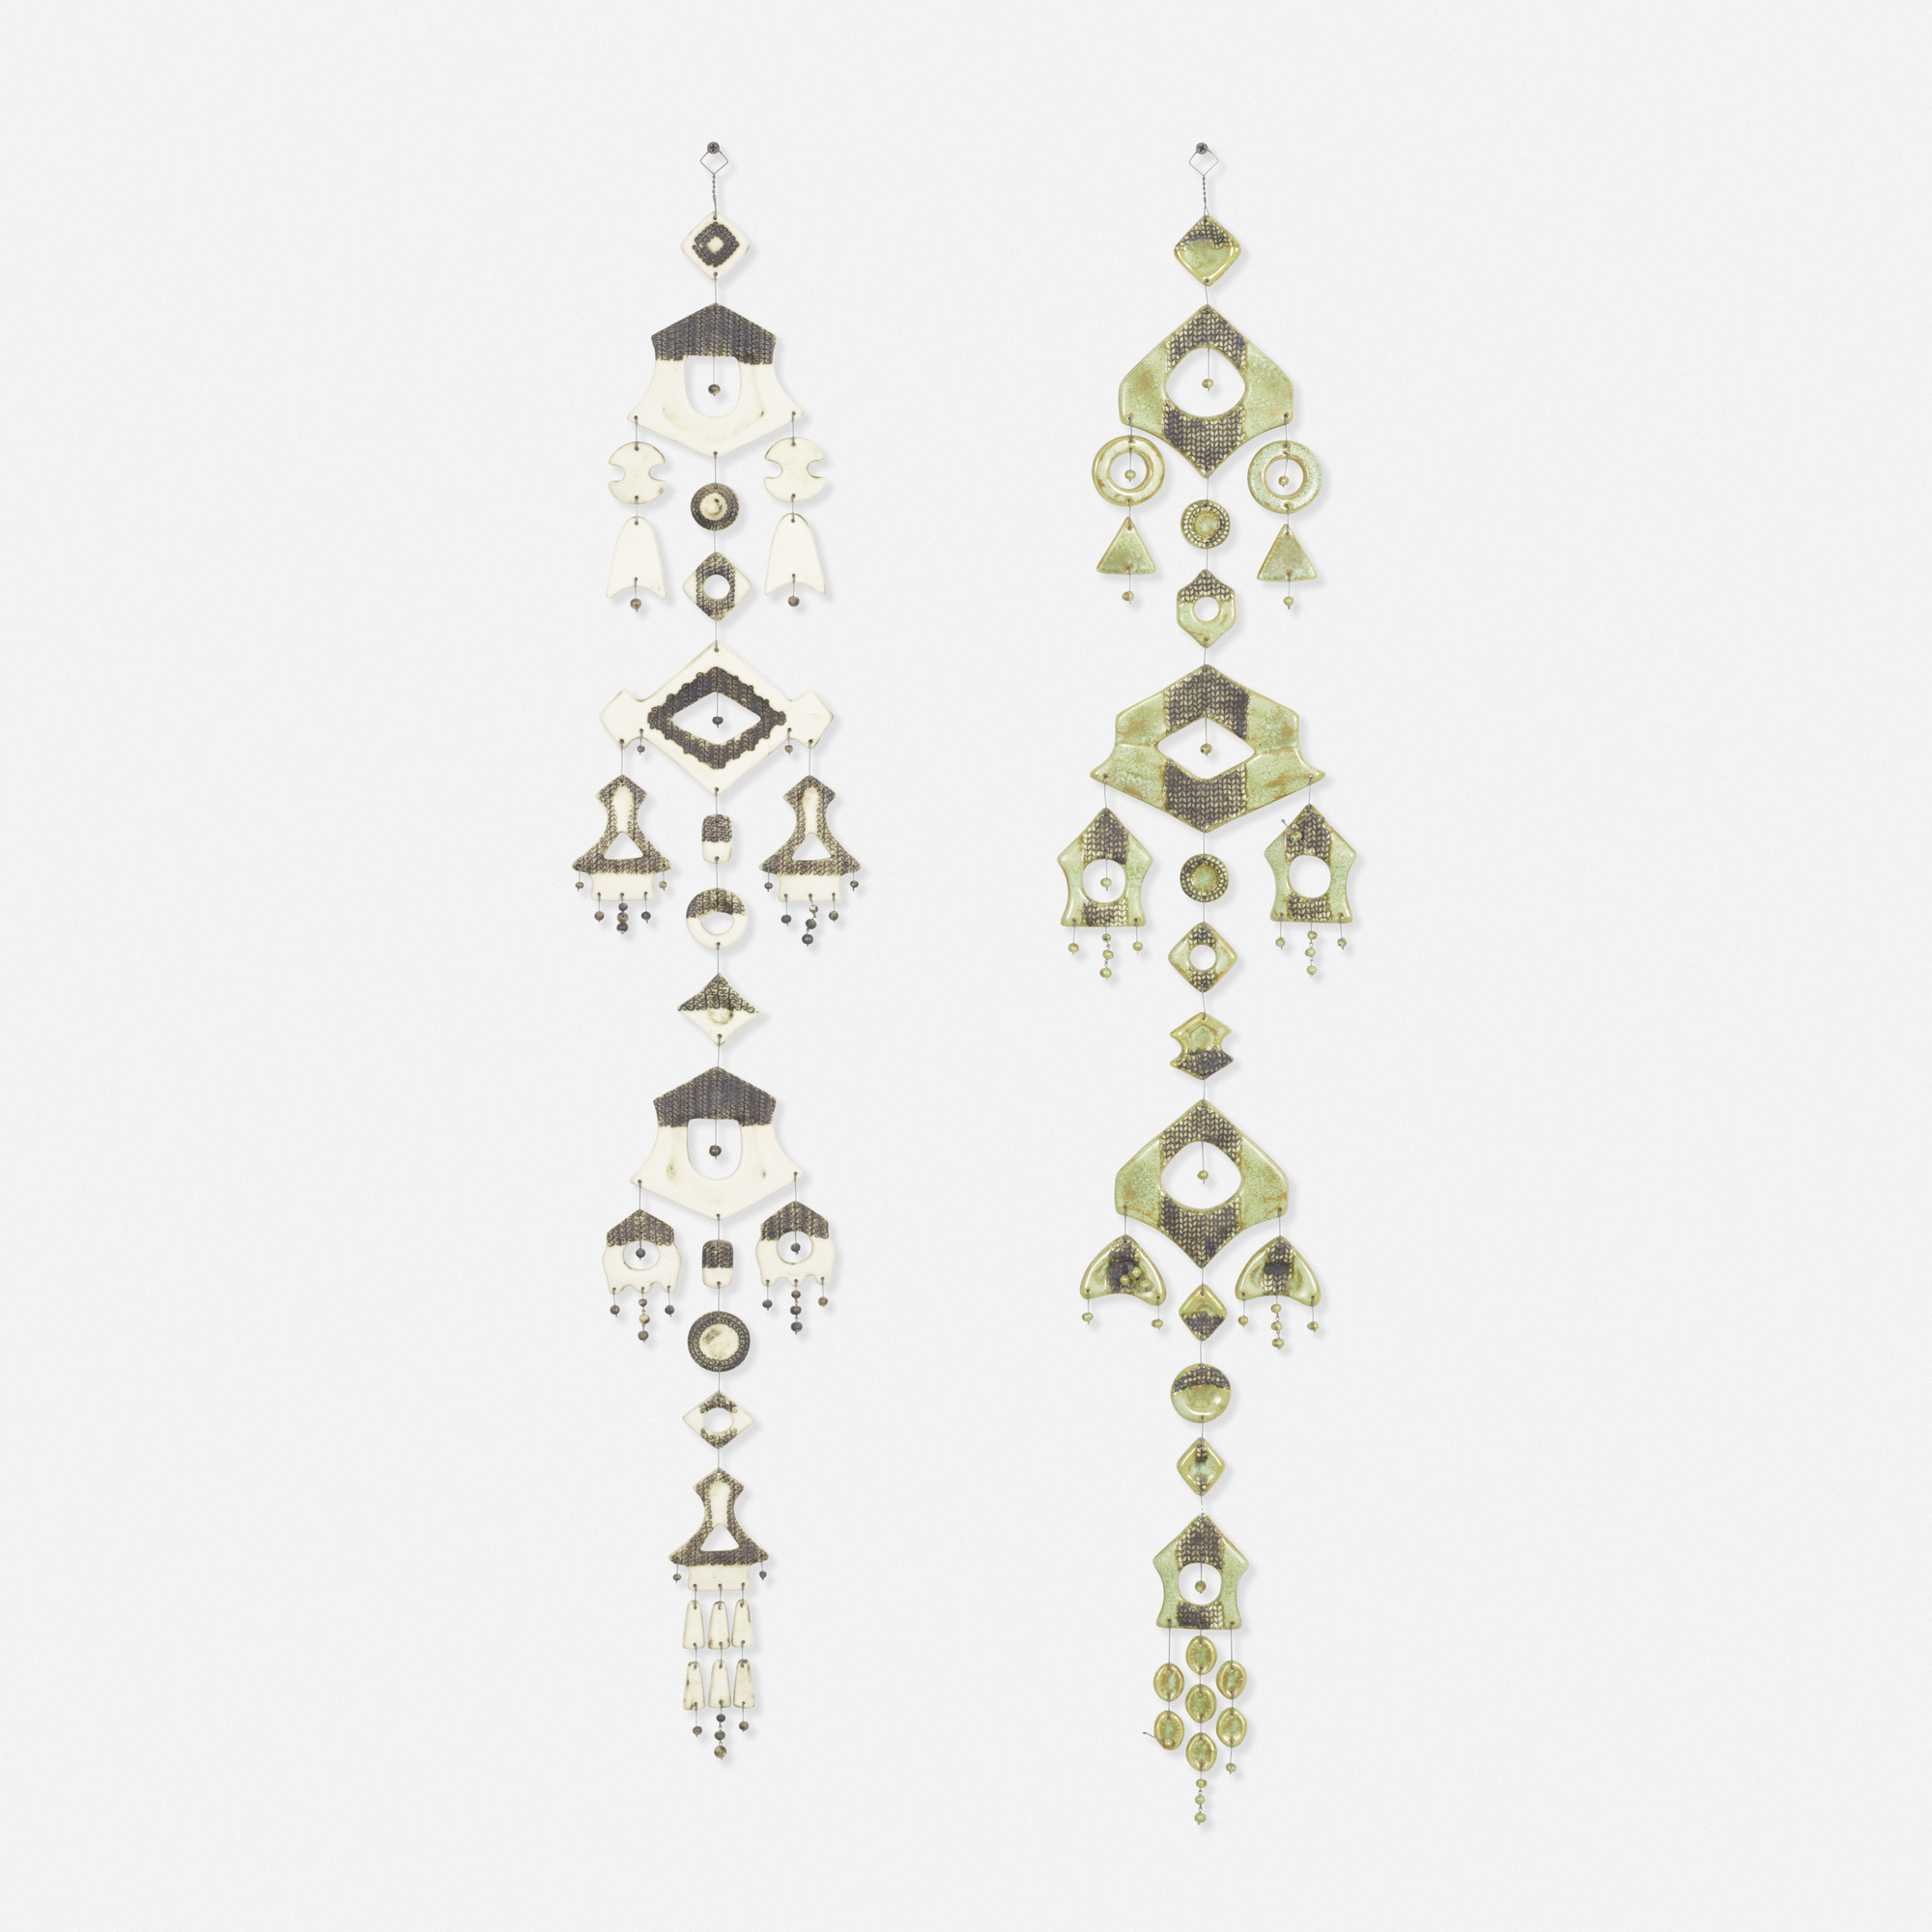 276: Kalevala Koru / pair of wall hangings (1 of 1)